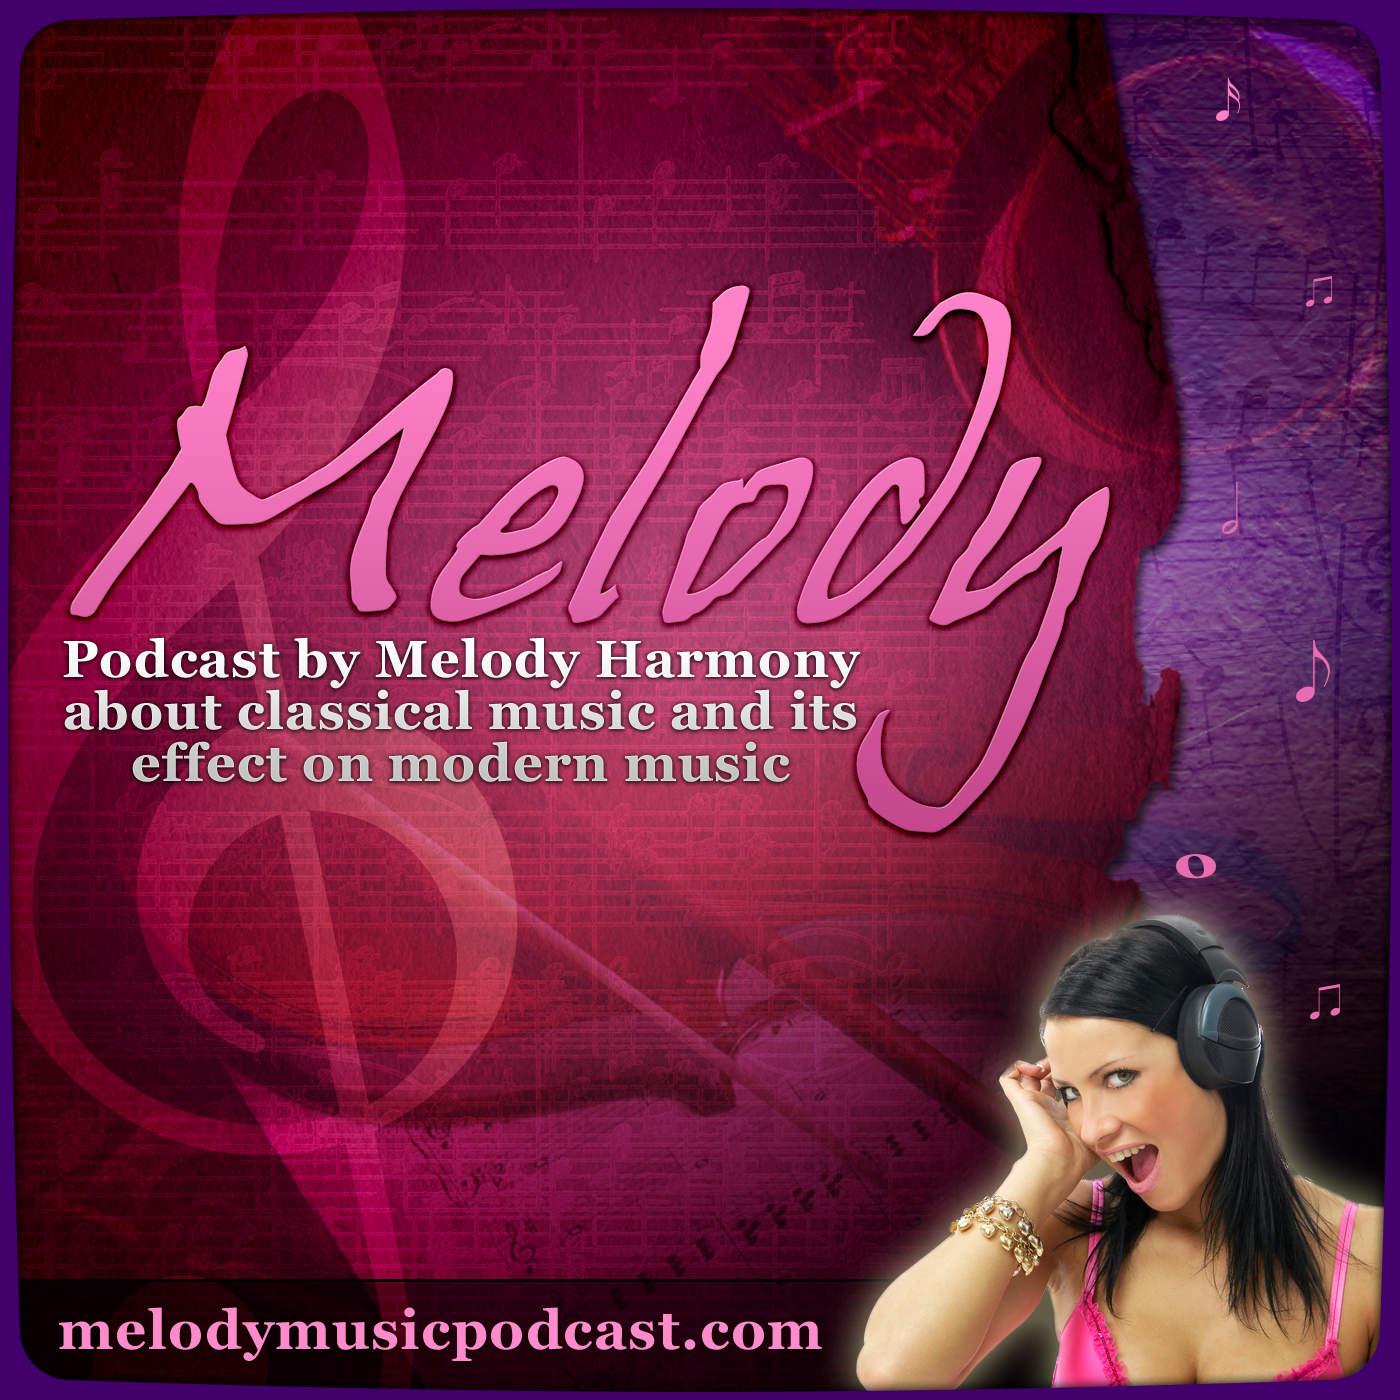 MelodyMusicPodcast